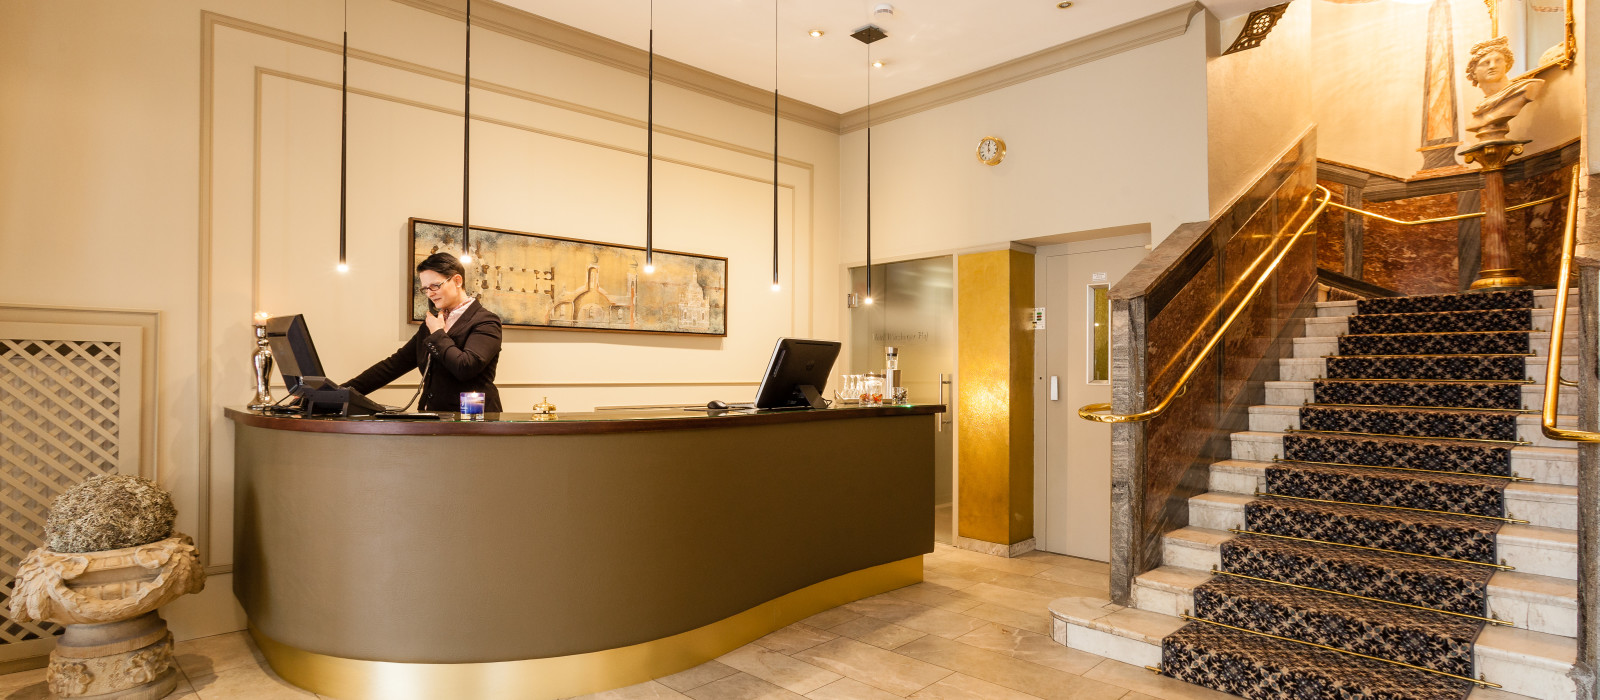 Hotel  Würzburger Hof Germany